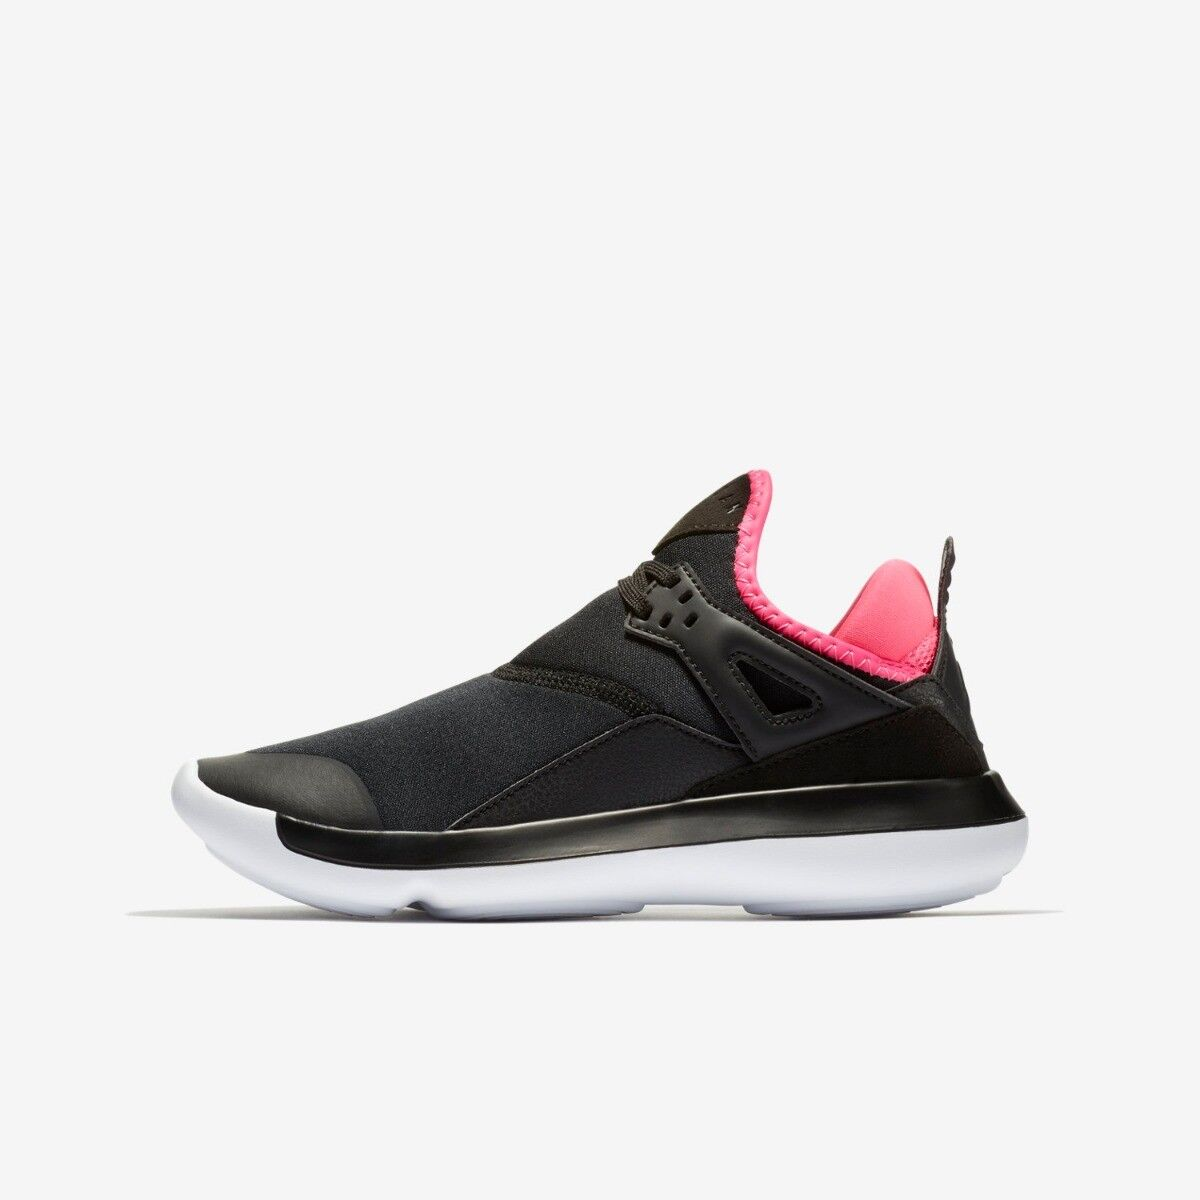 Nike Jordan Mouche '89 Gg Filles Basketball Tennis Tennis Tennis Noir pour Rose Neuf | Formes élégantes  e287d2